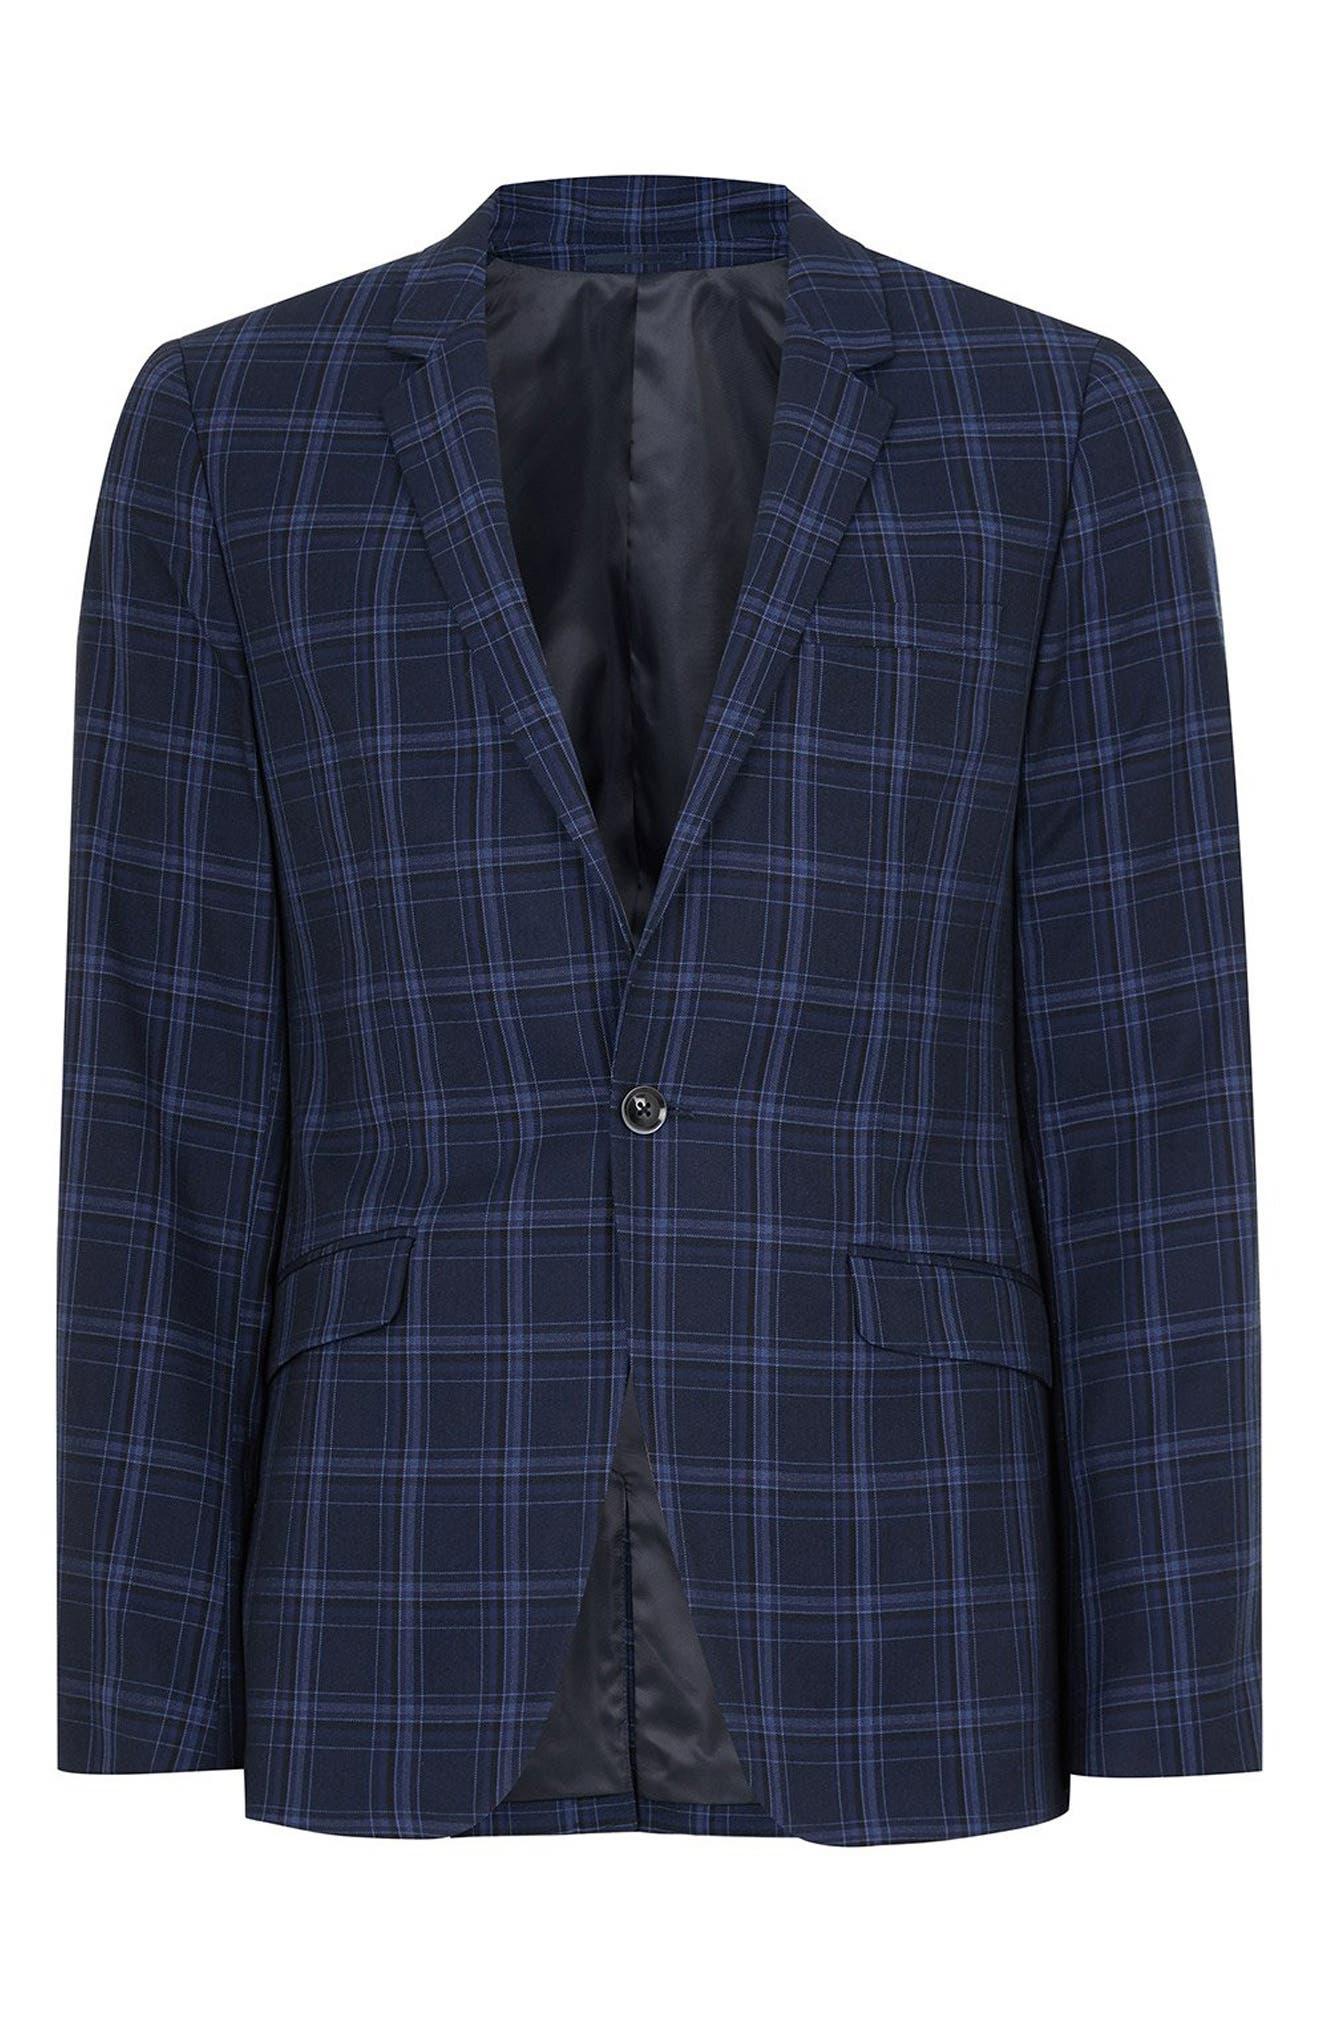 TOPMAN, Skinny Fit Check Suit Jacket, Alternate thumbnail 4, color, 400